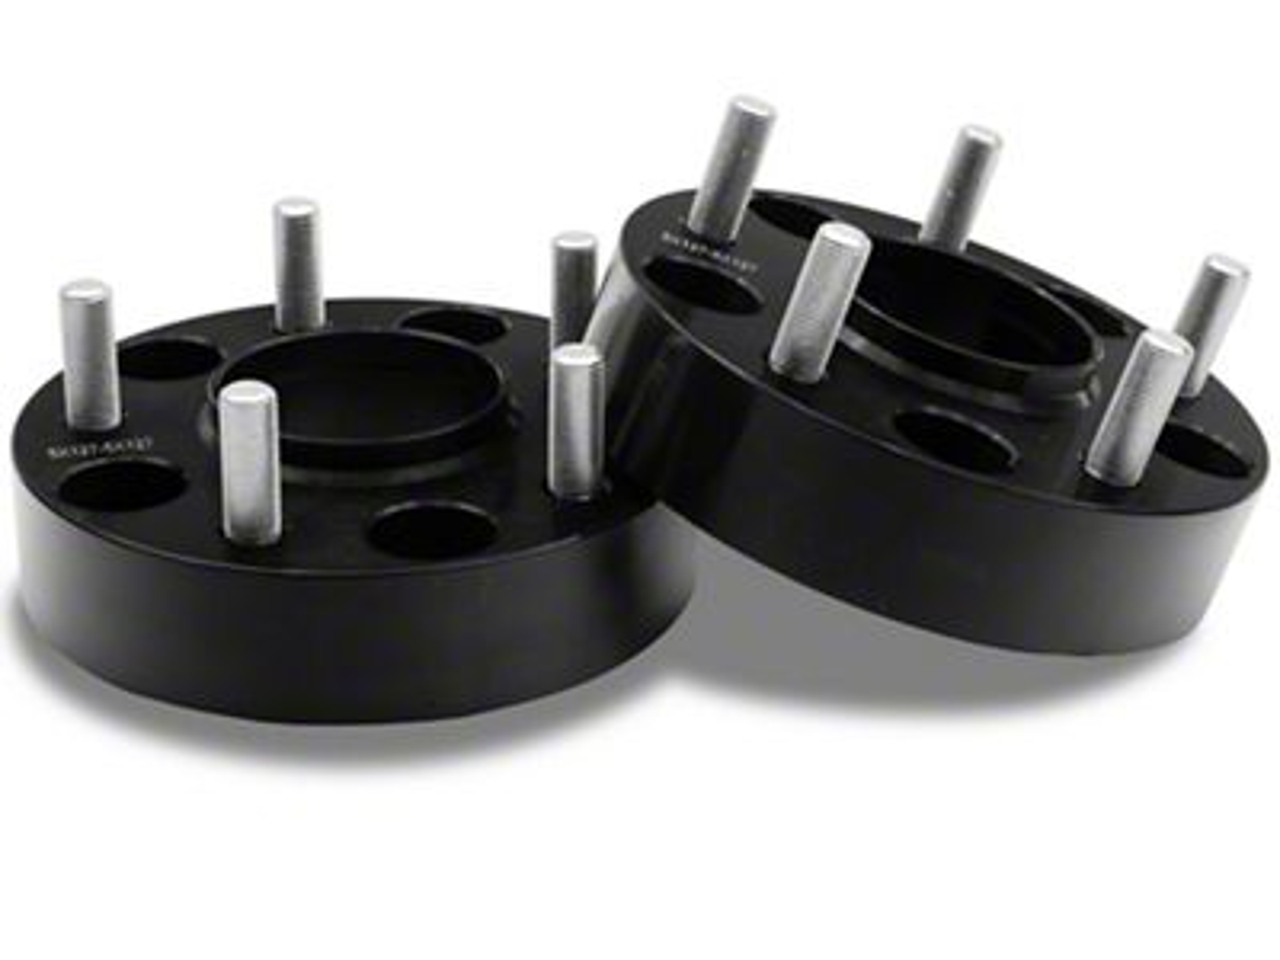 RedRock 4x4 1.5 in. Wheel Spacers - Black - 5x5 Bolt Pattern (07-18 Jeep Wrangler JK)